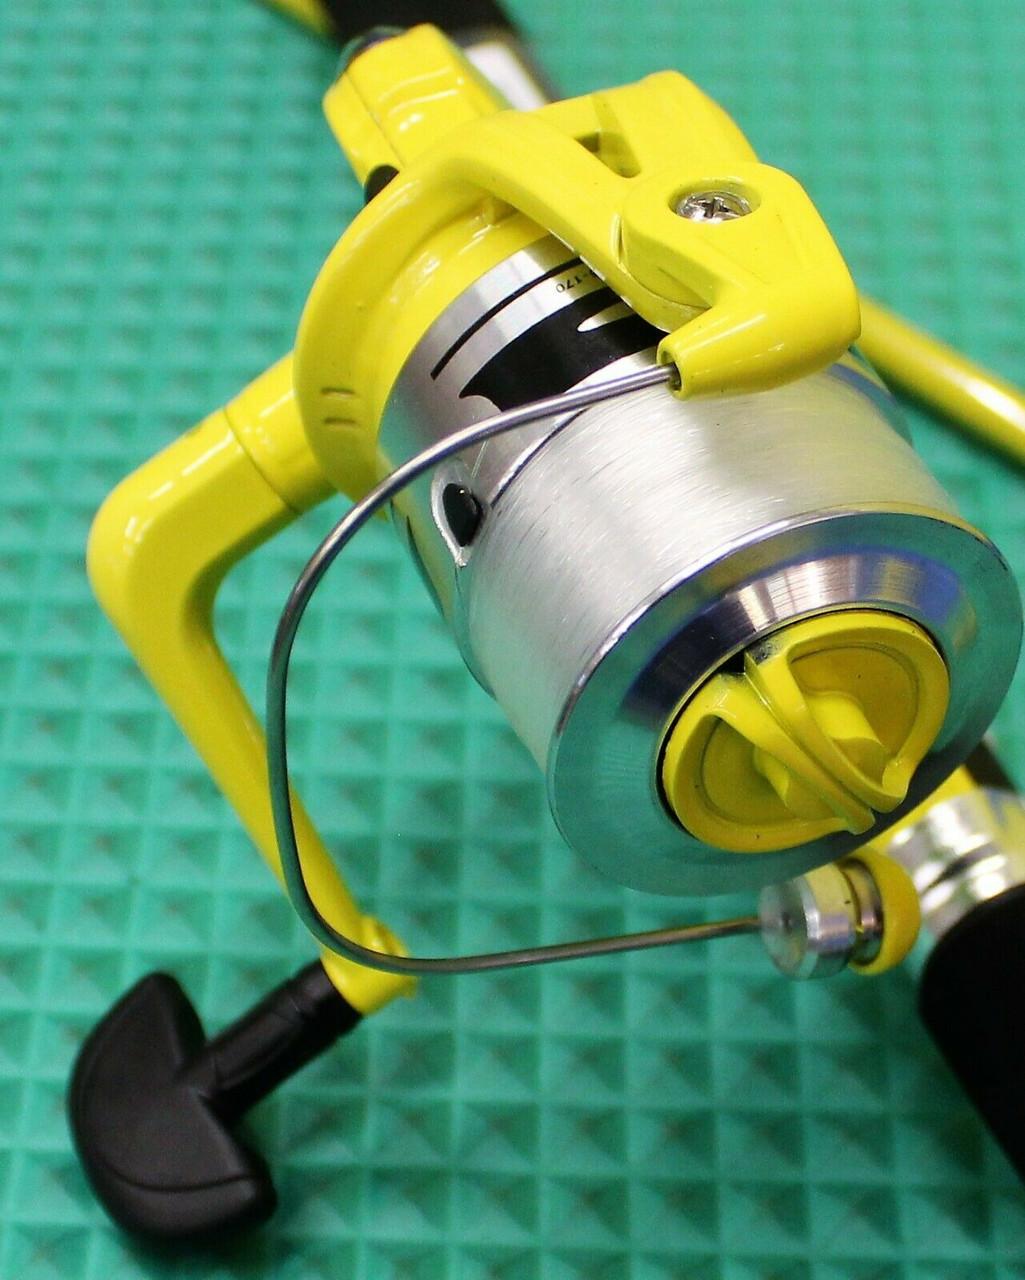 "Okuma Fin Chaser X Spinning Combo Yellow 8' 0"" Rod 2 Piece 40 Reel Spooled  FNX-80-40YL"